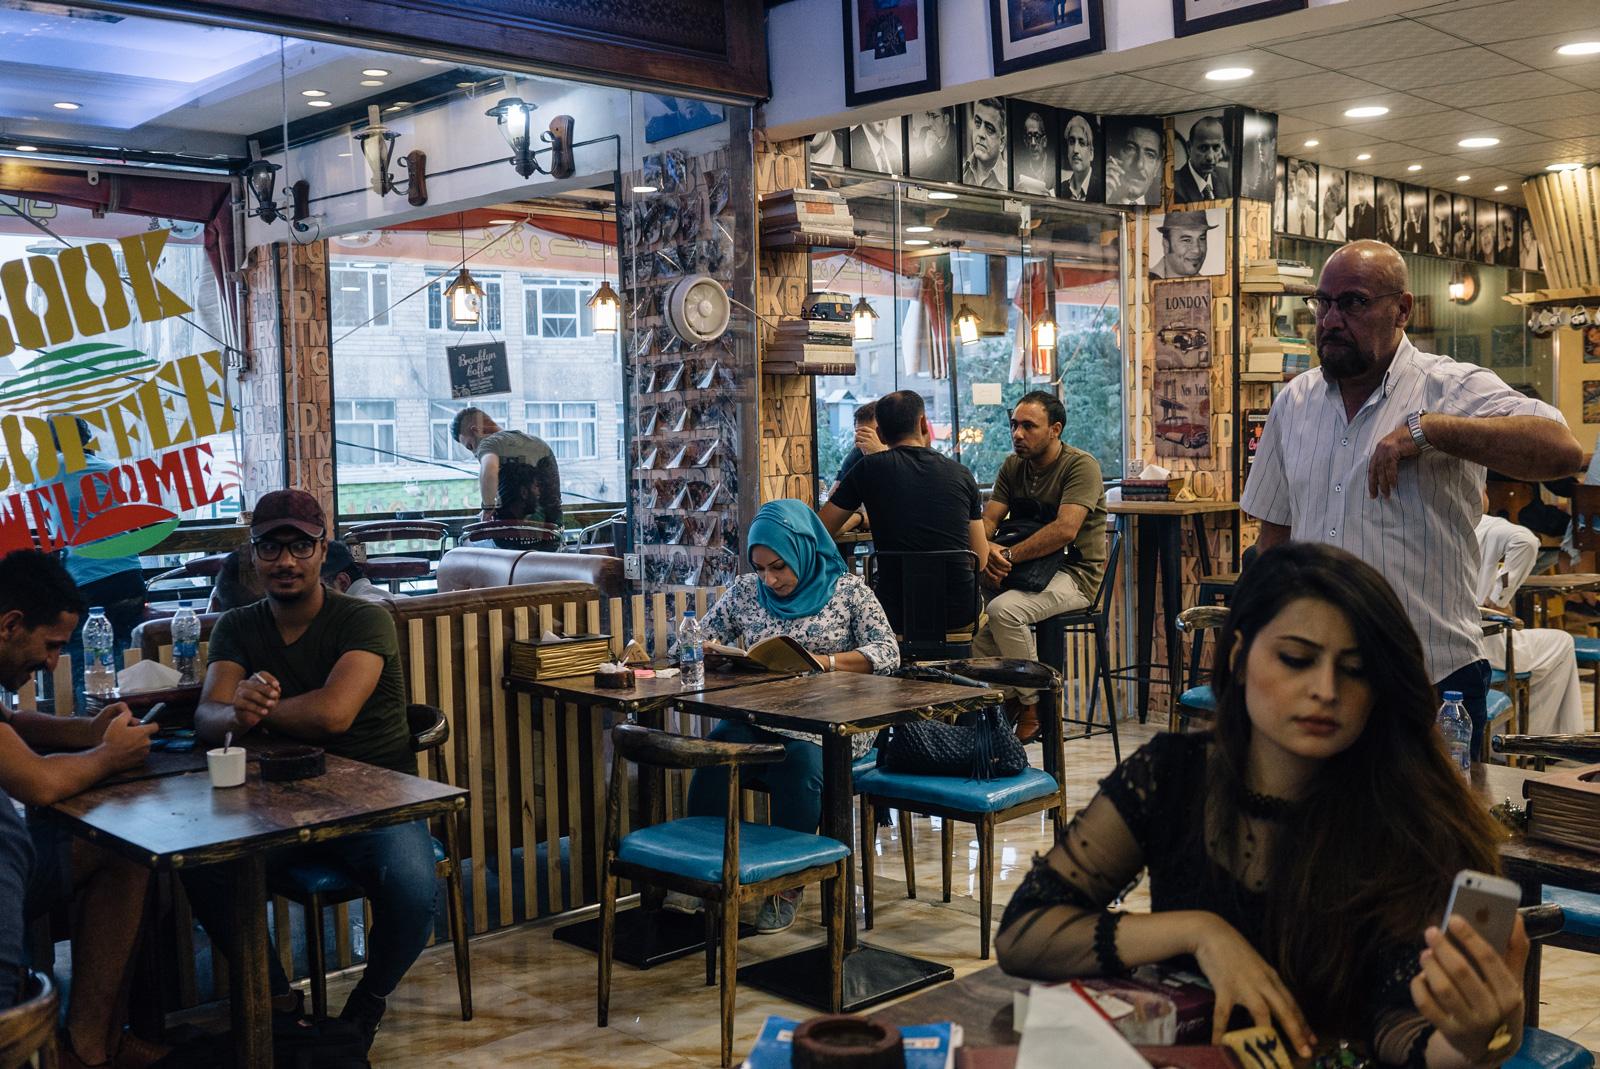 Baghdad gets its groove back